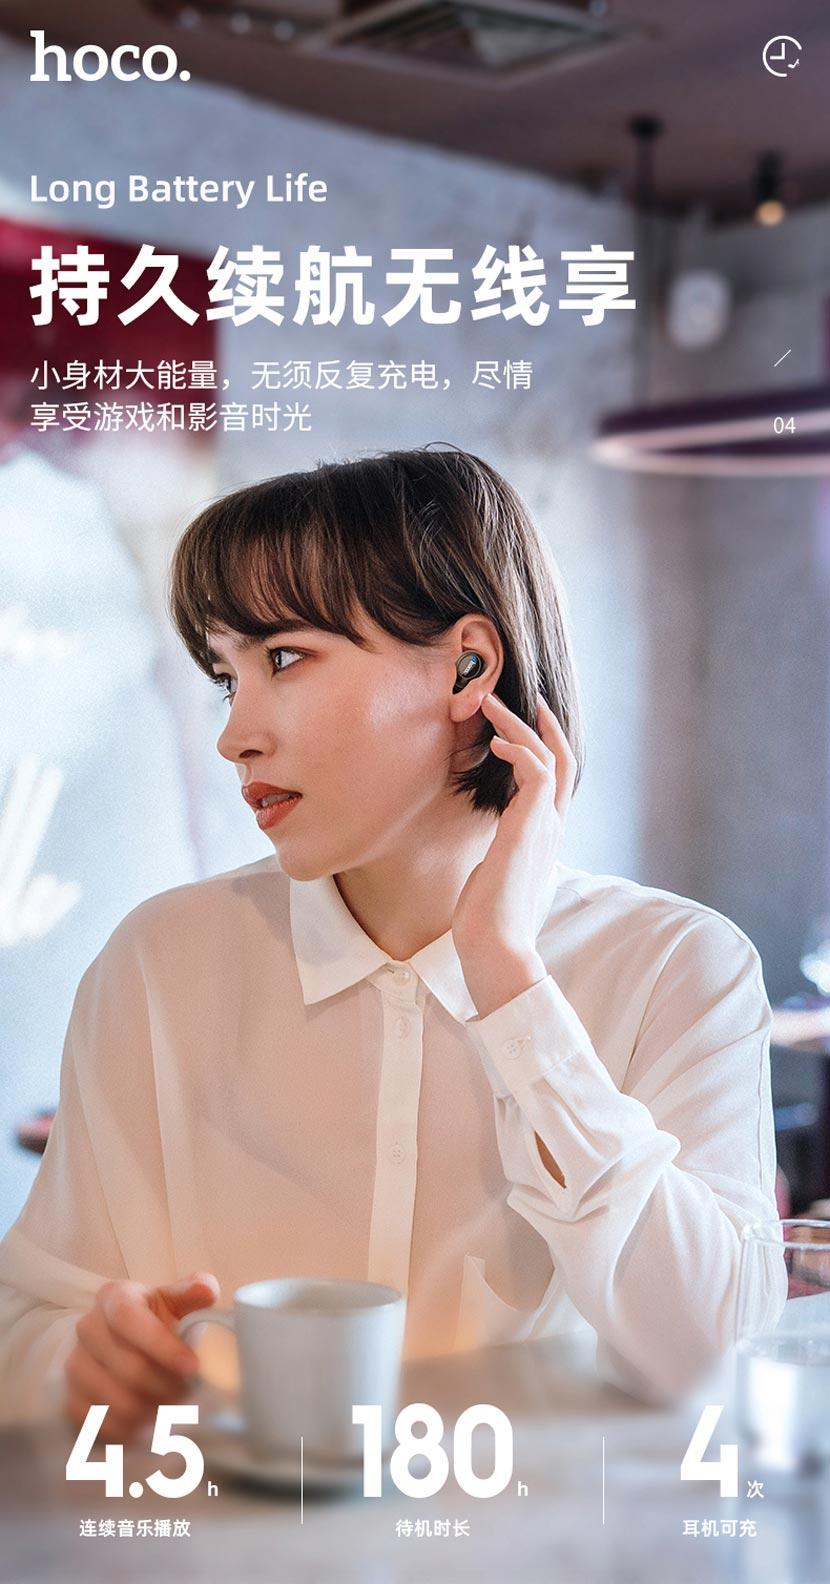 hoco news es52 delight tws wireless bt headset long lasting cn